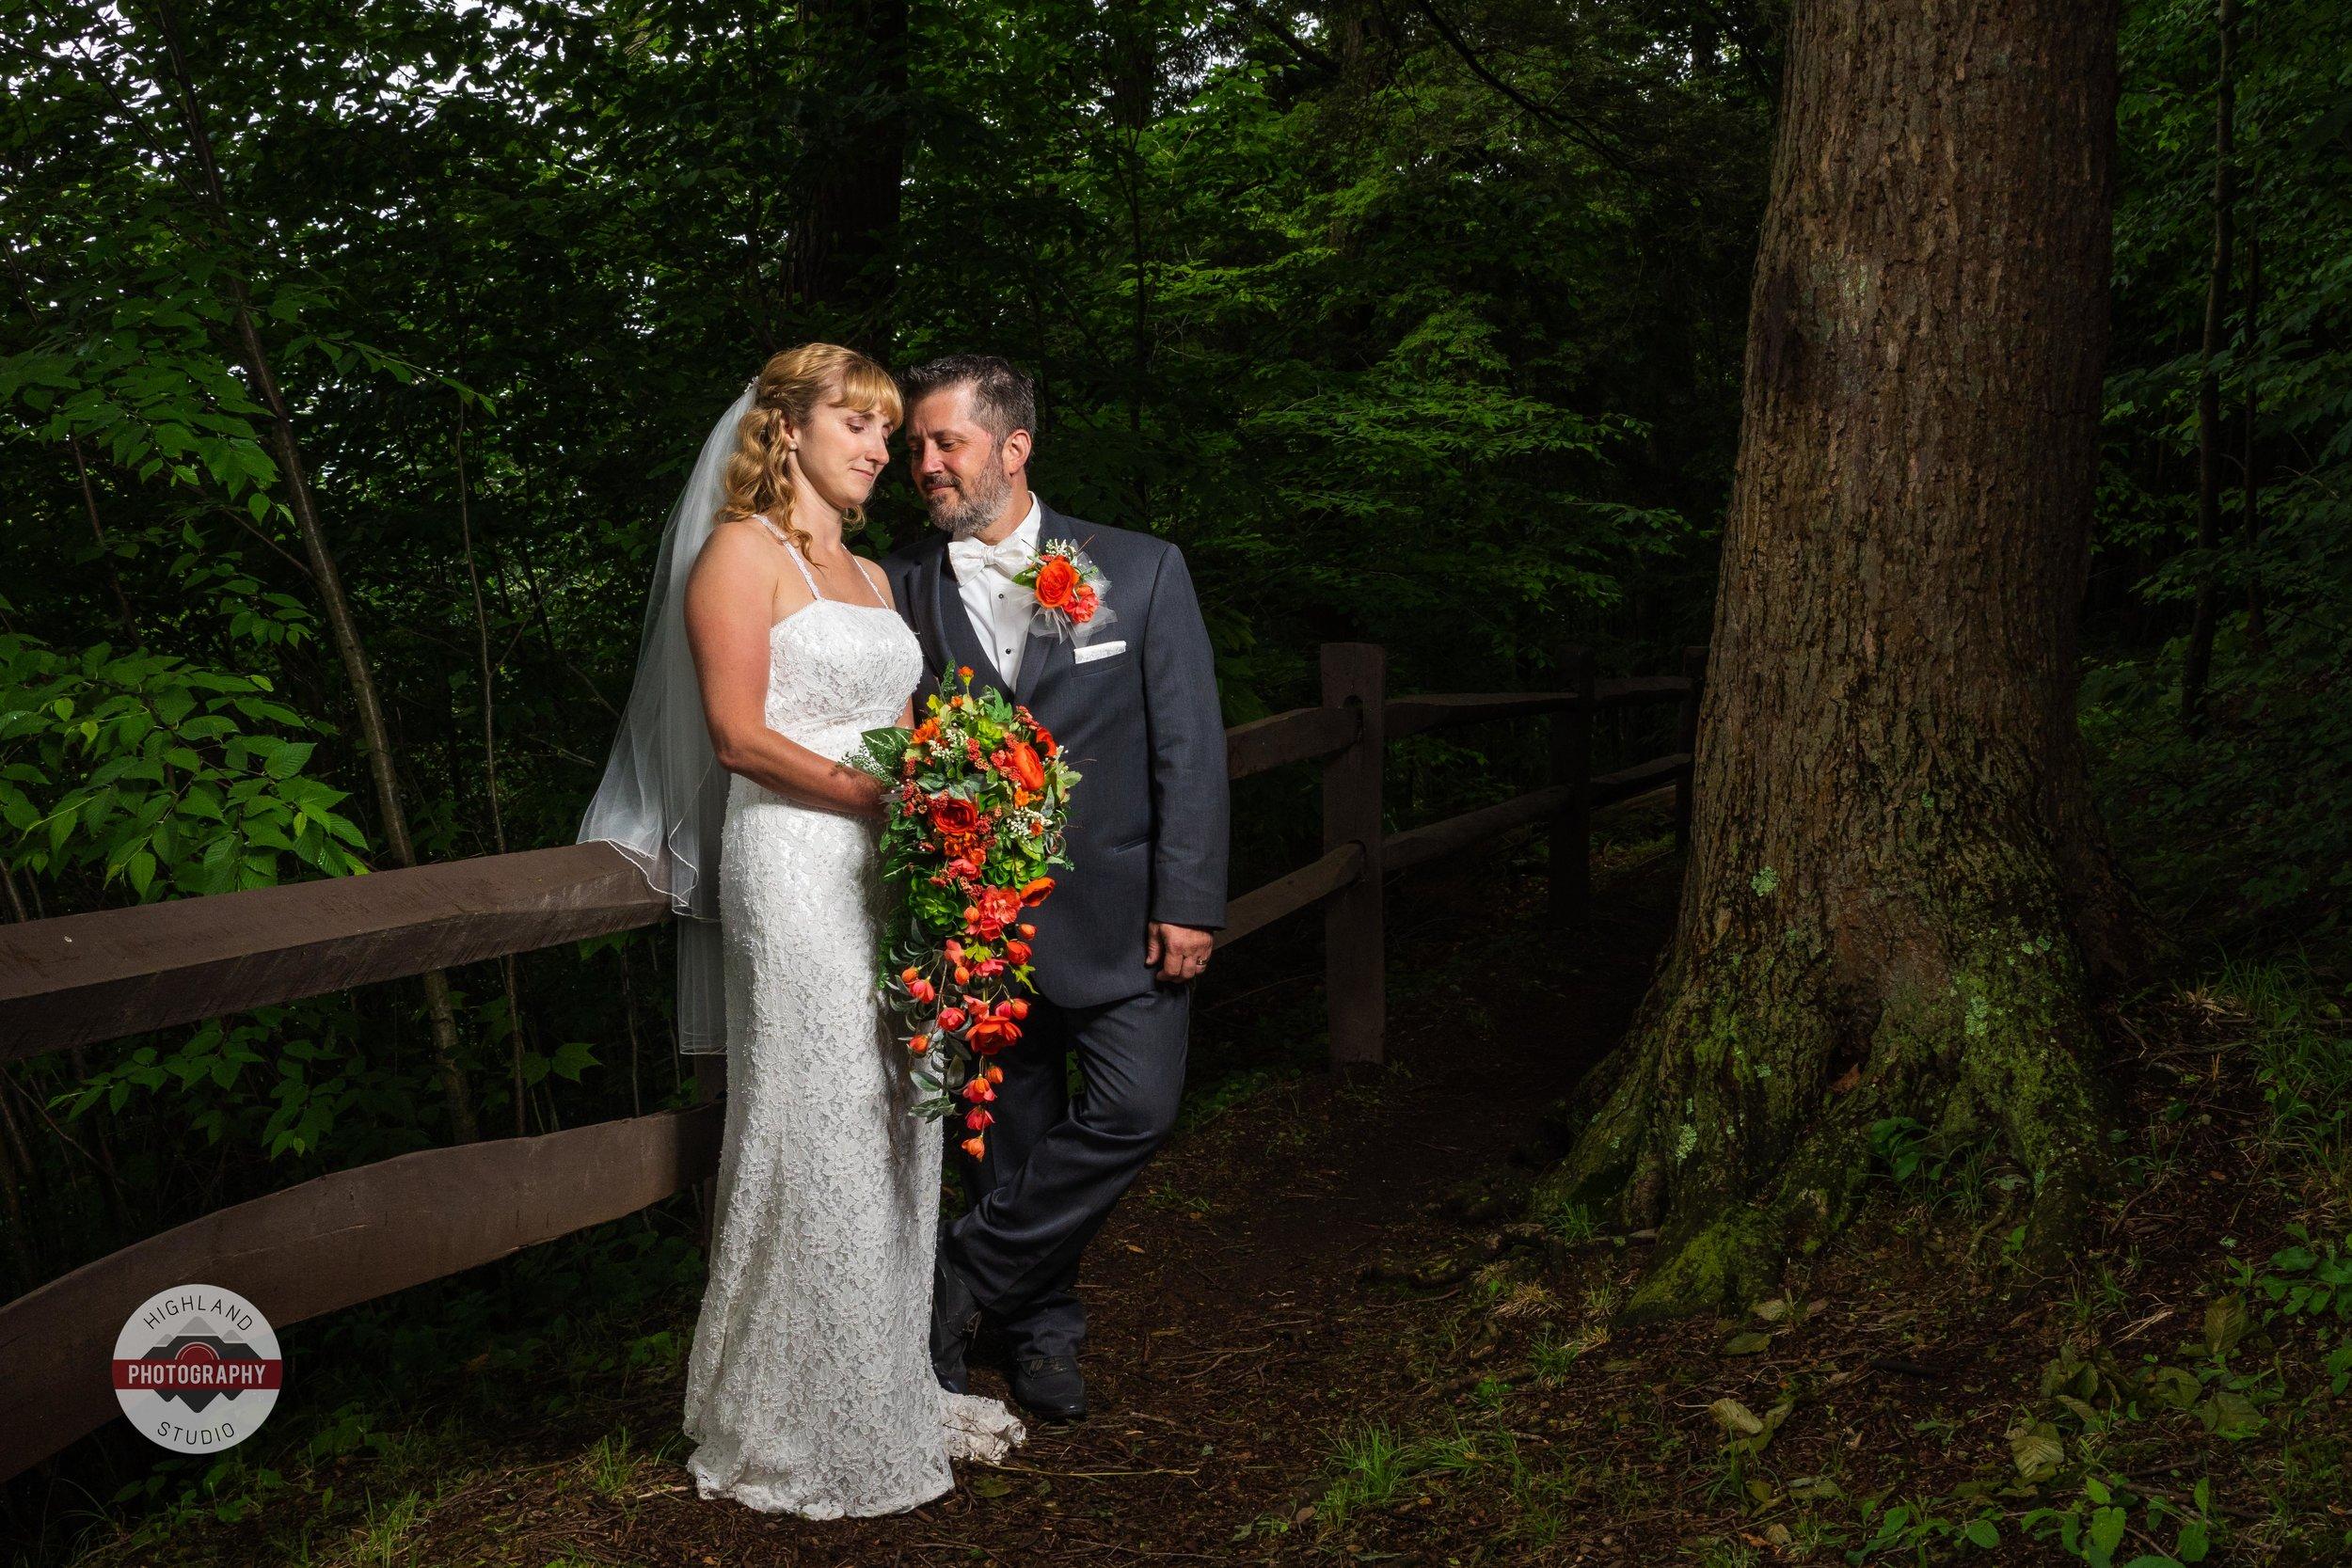 Highland Photography Studio-Williamsport wedding Photographer-4.jpg